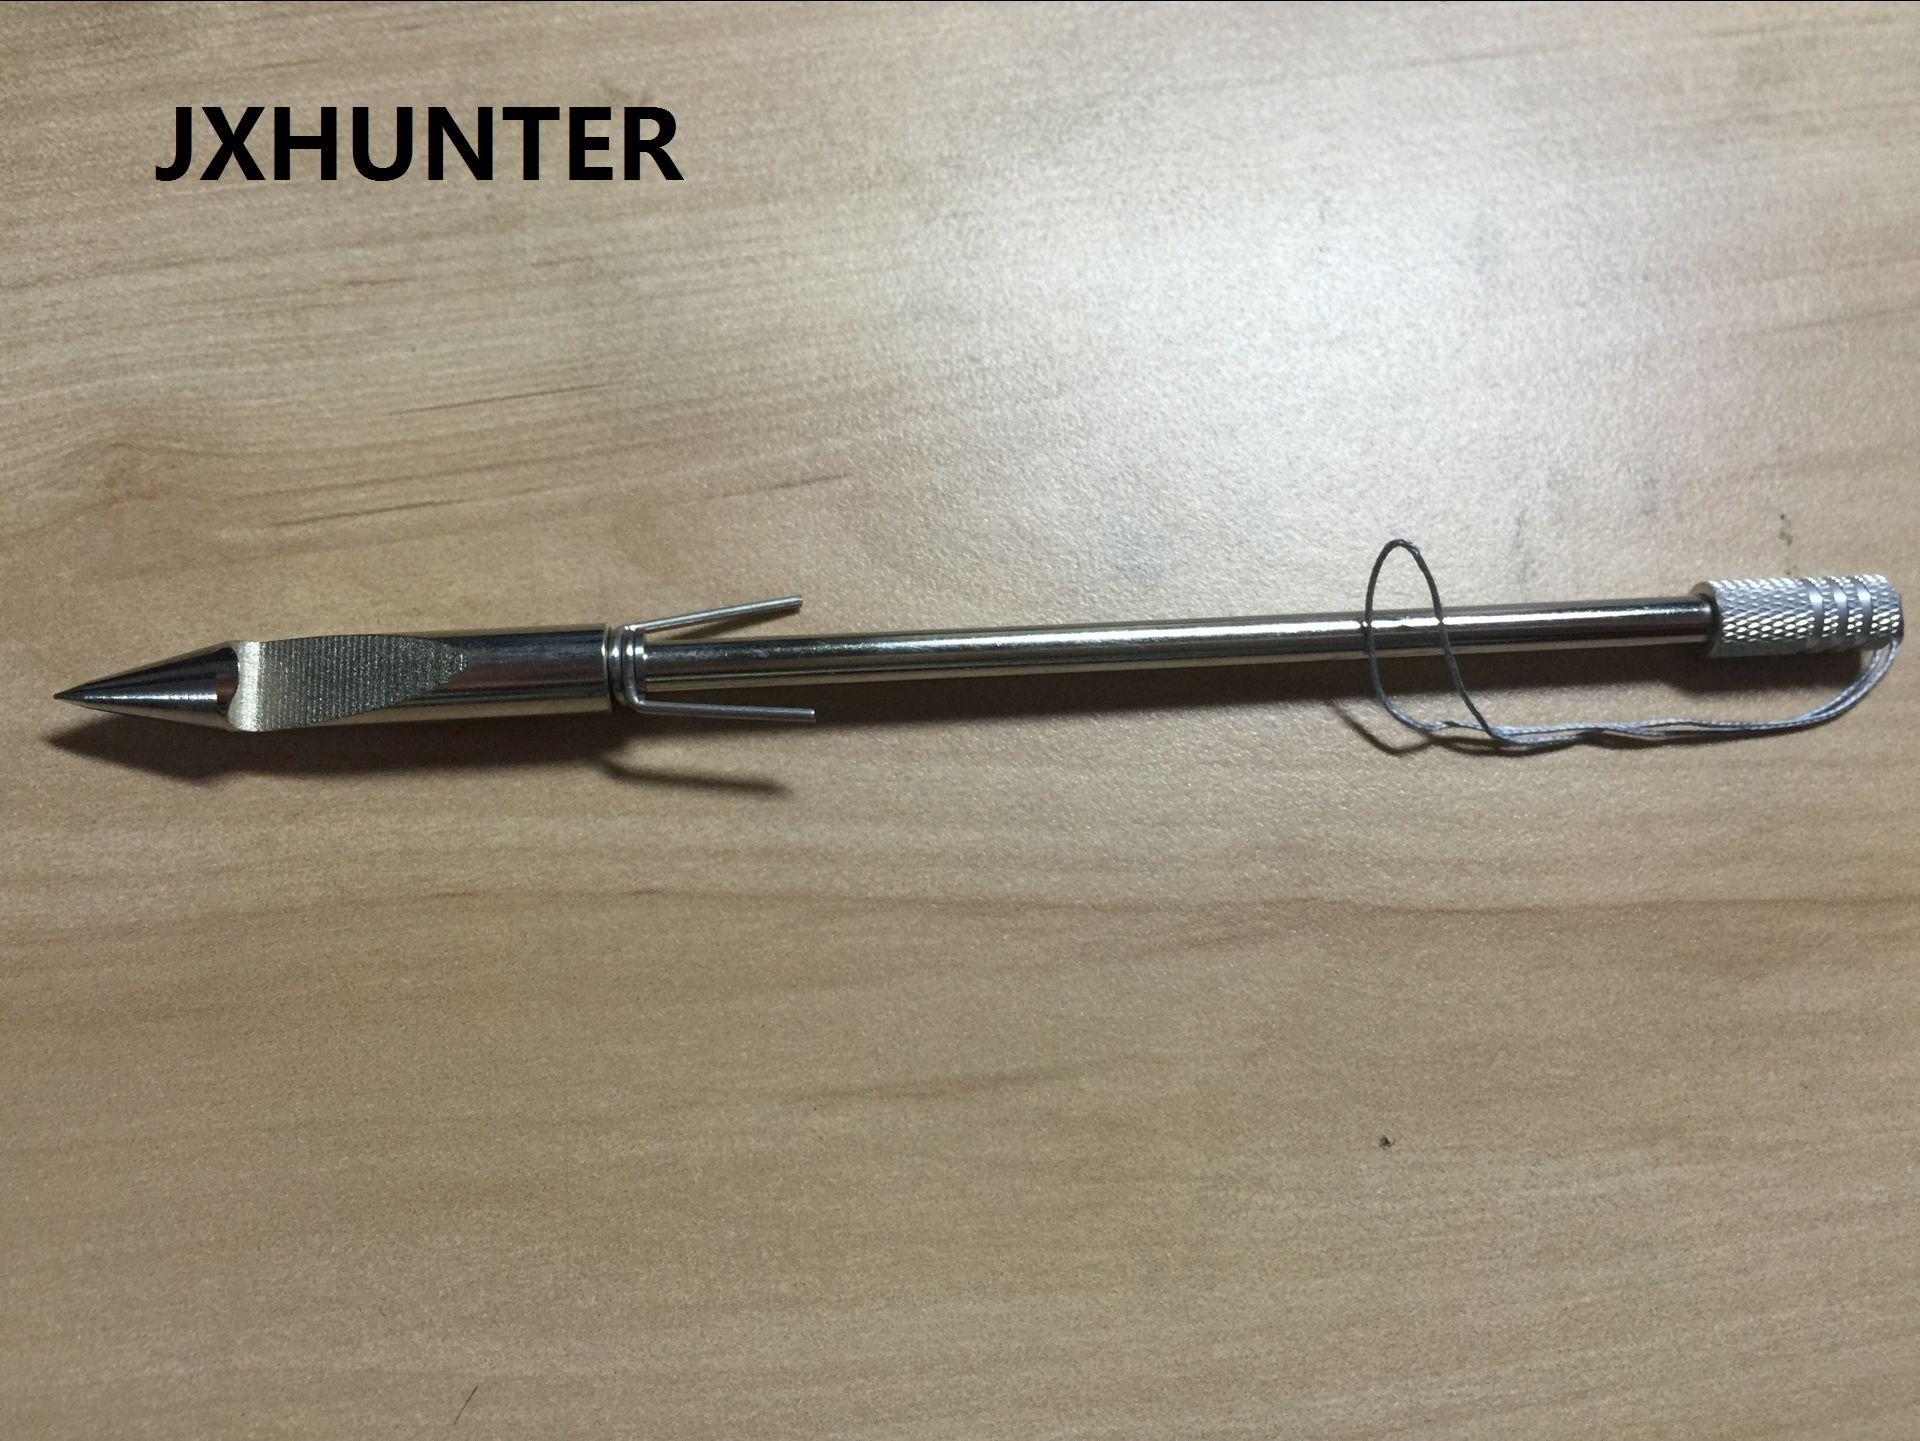 3 PK 강 낚시 화살 Broadheads Slingshot 낚시 사냥 팁 용 화살촉 6.3 인치 35g